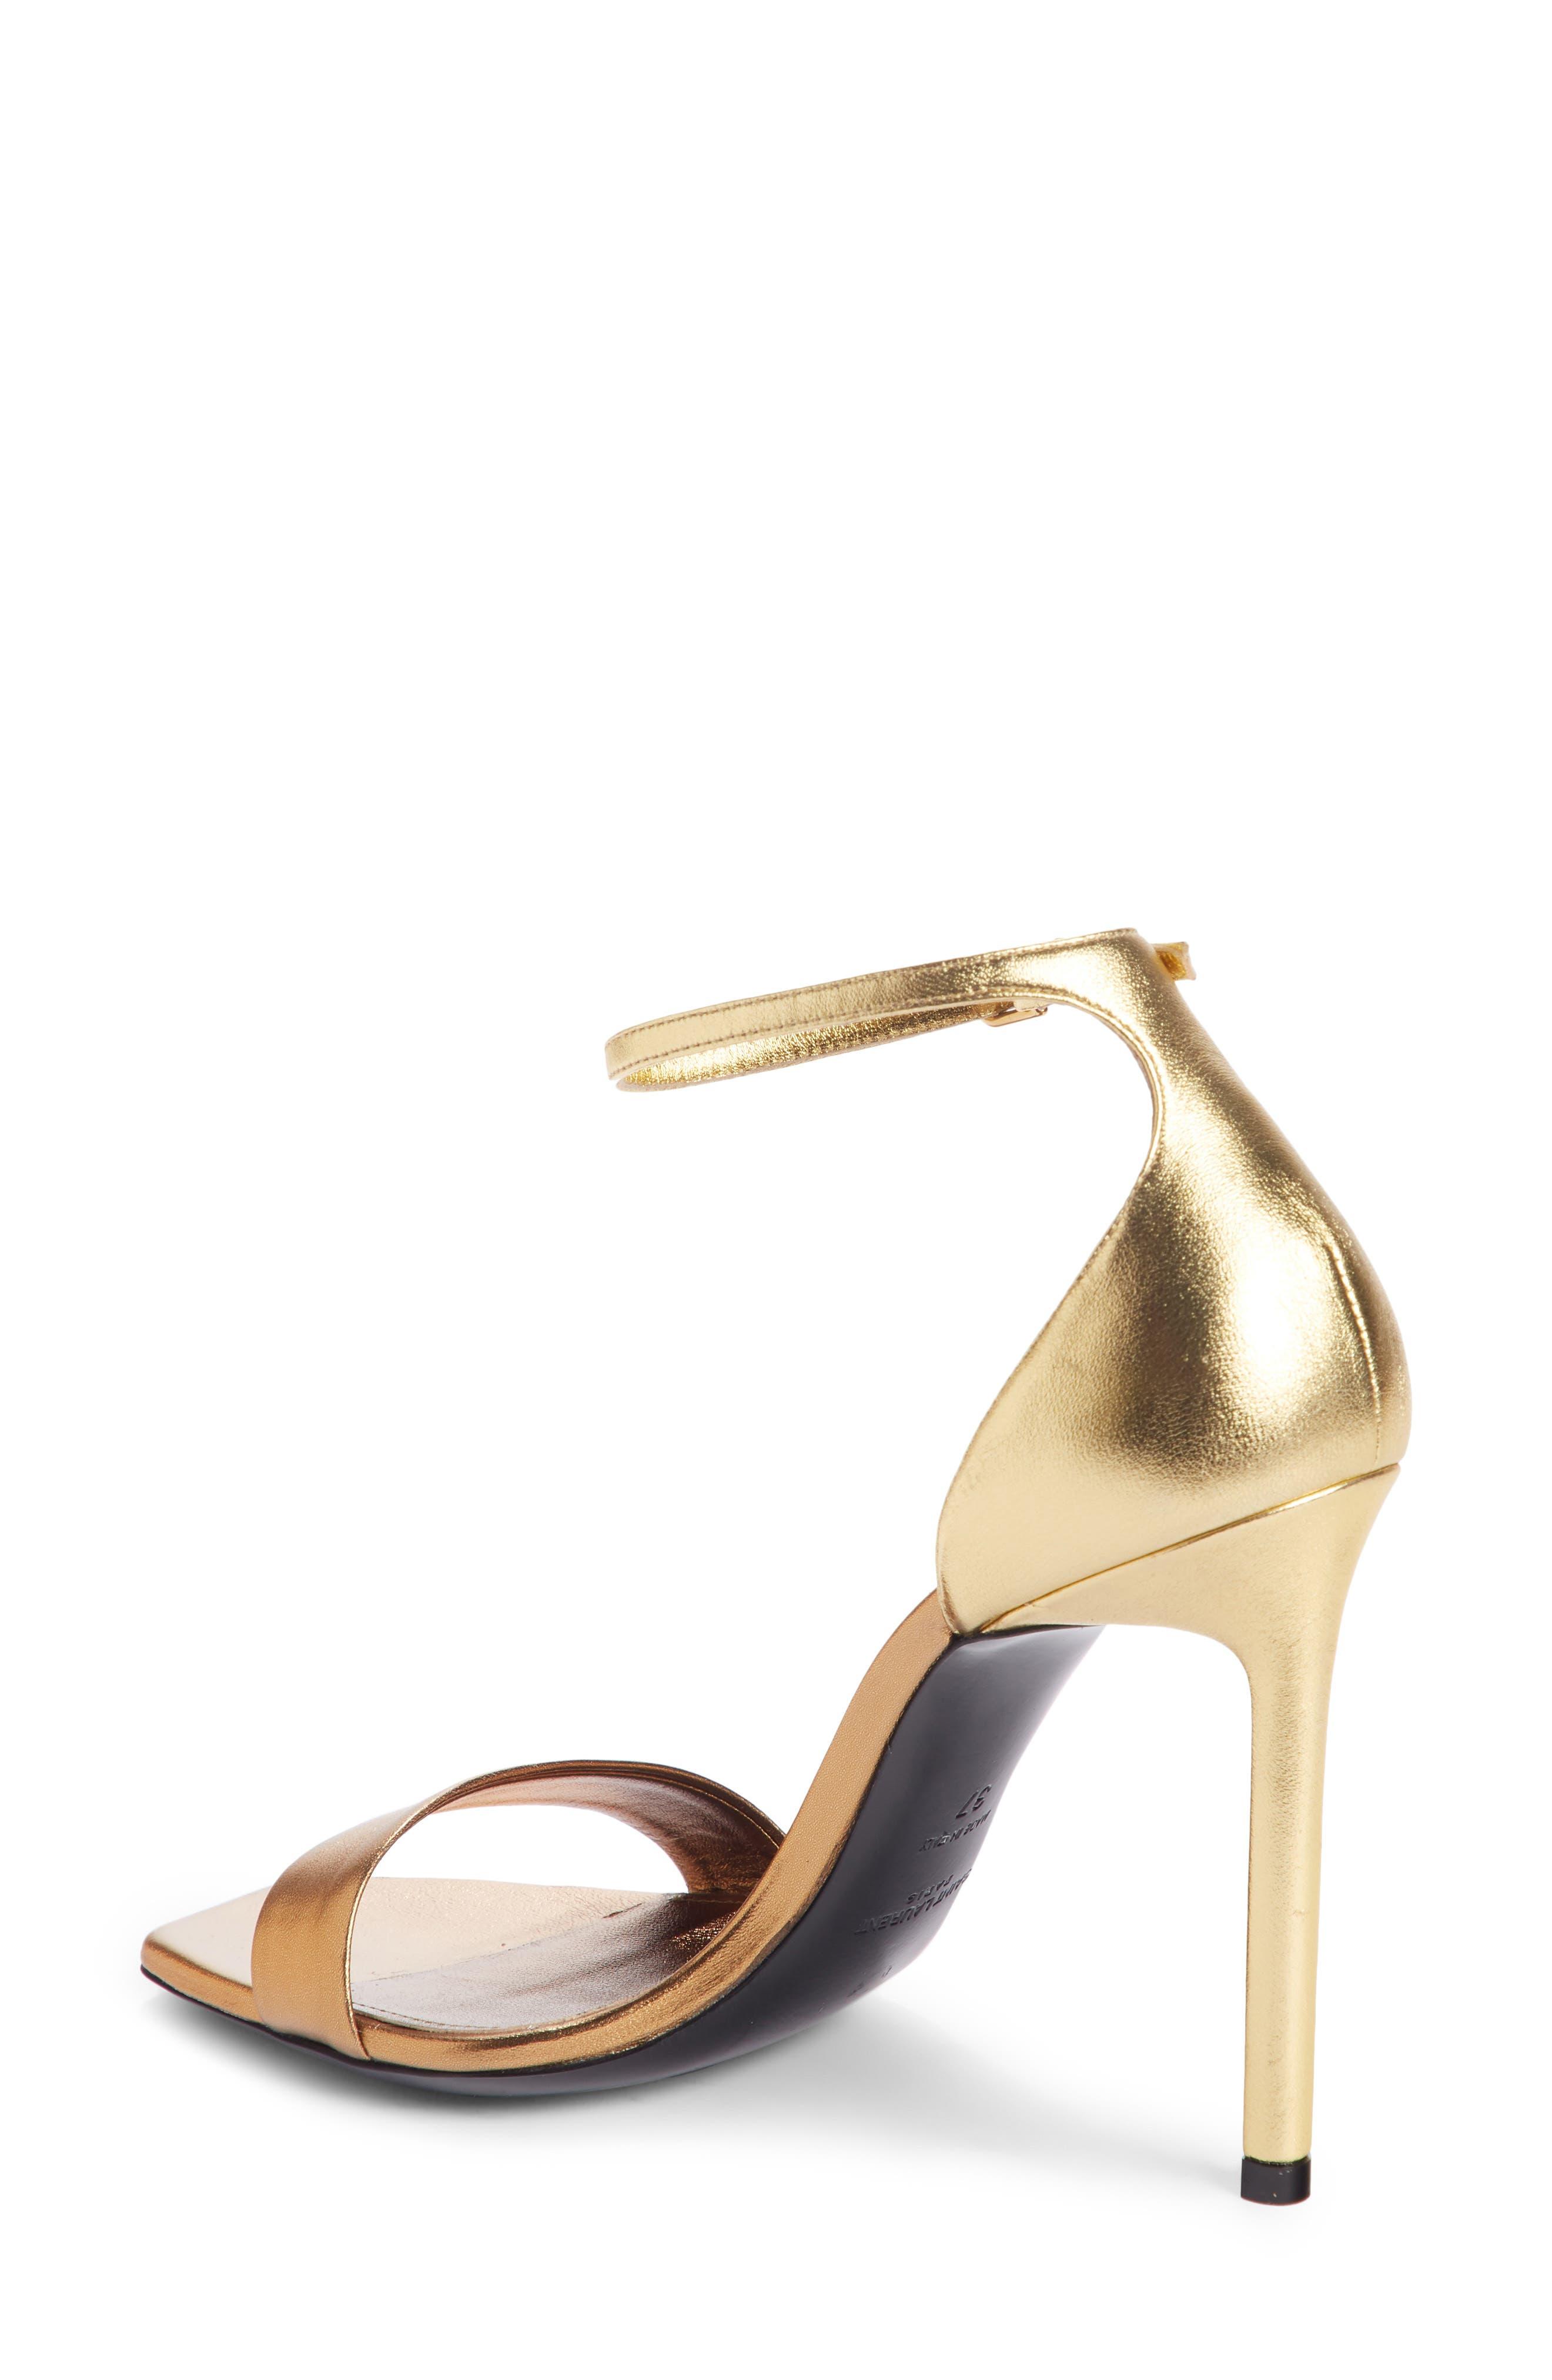 Amber Ankle Strap Sandal,                             Alternate thumbnail 2, color,                             BRONZE GOLD